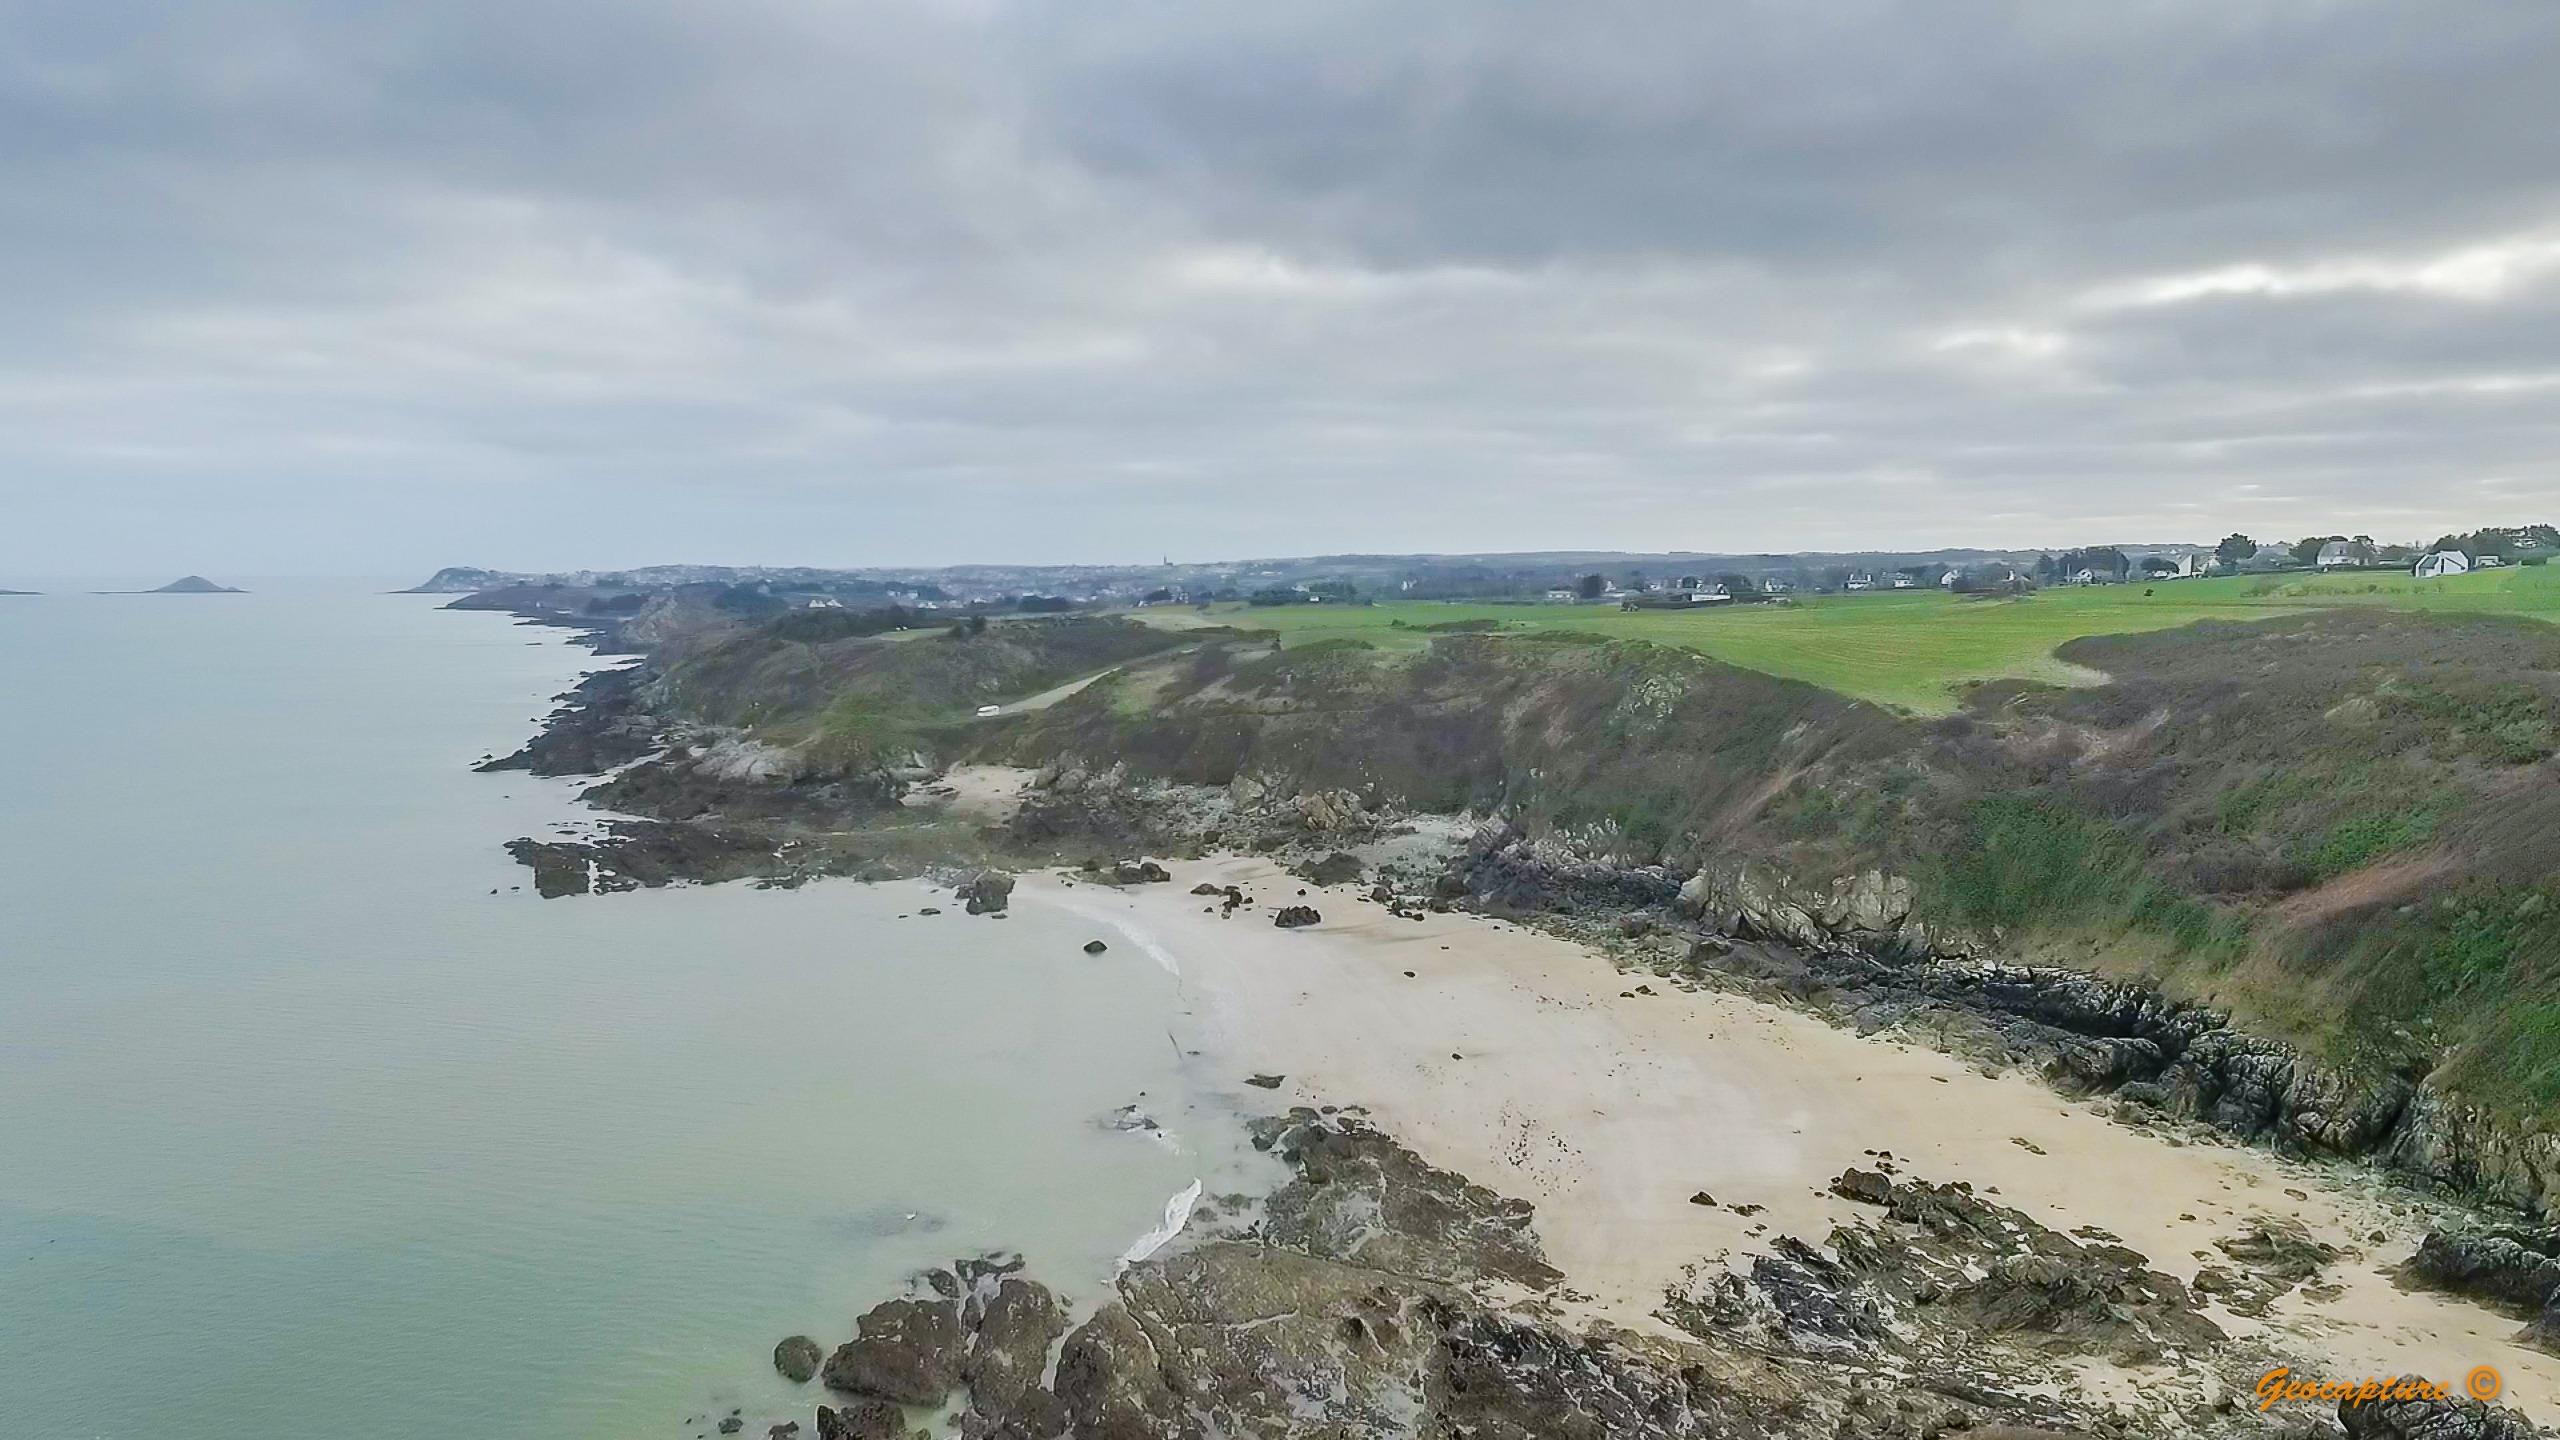 Drone image of a coastline